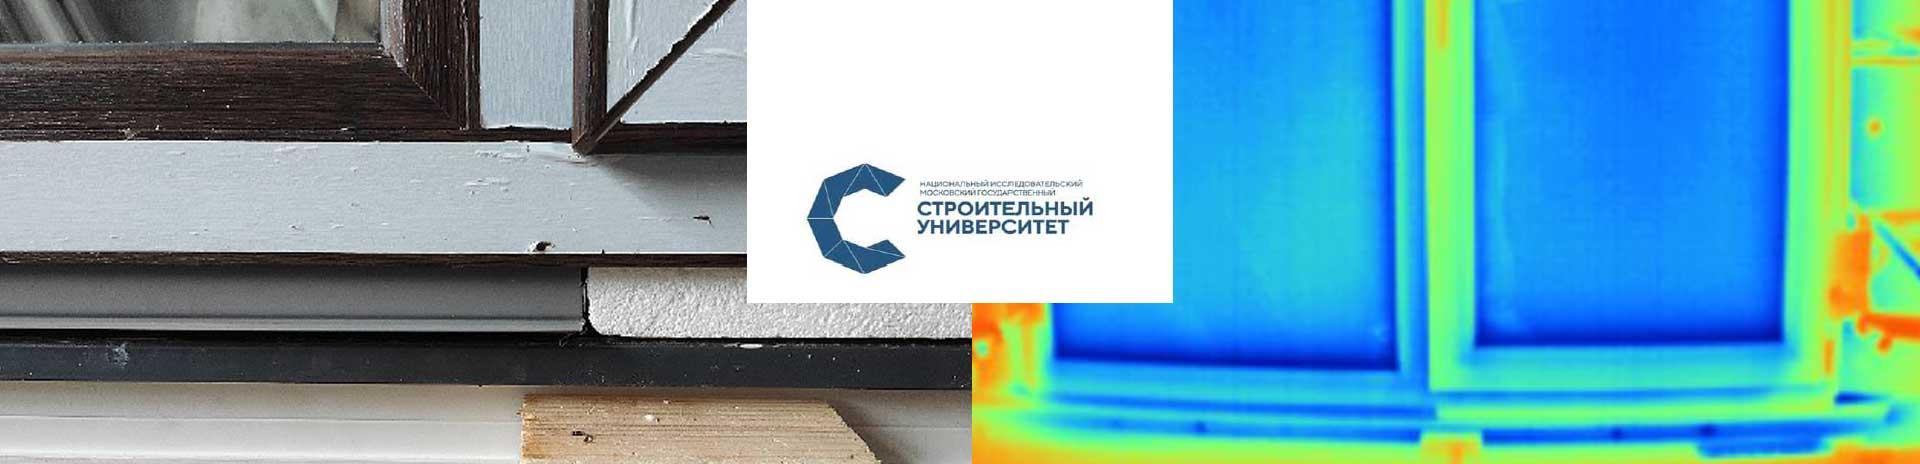 CF® теплее и тверже стандартного ПВХ-подставочник